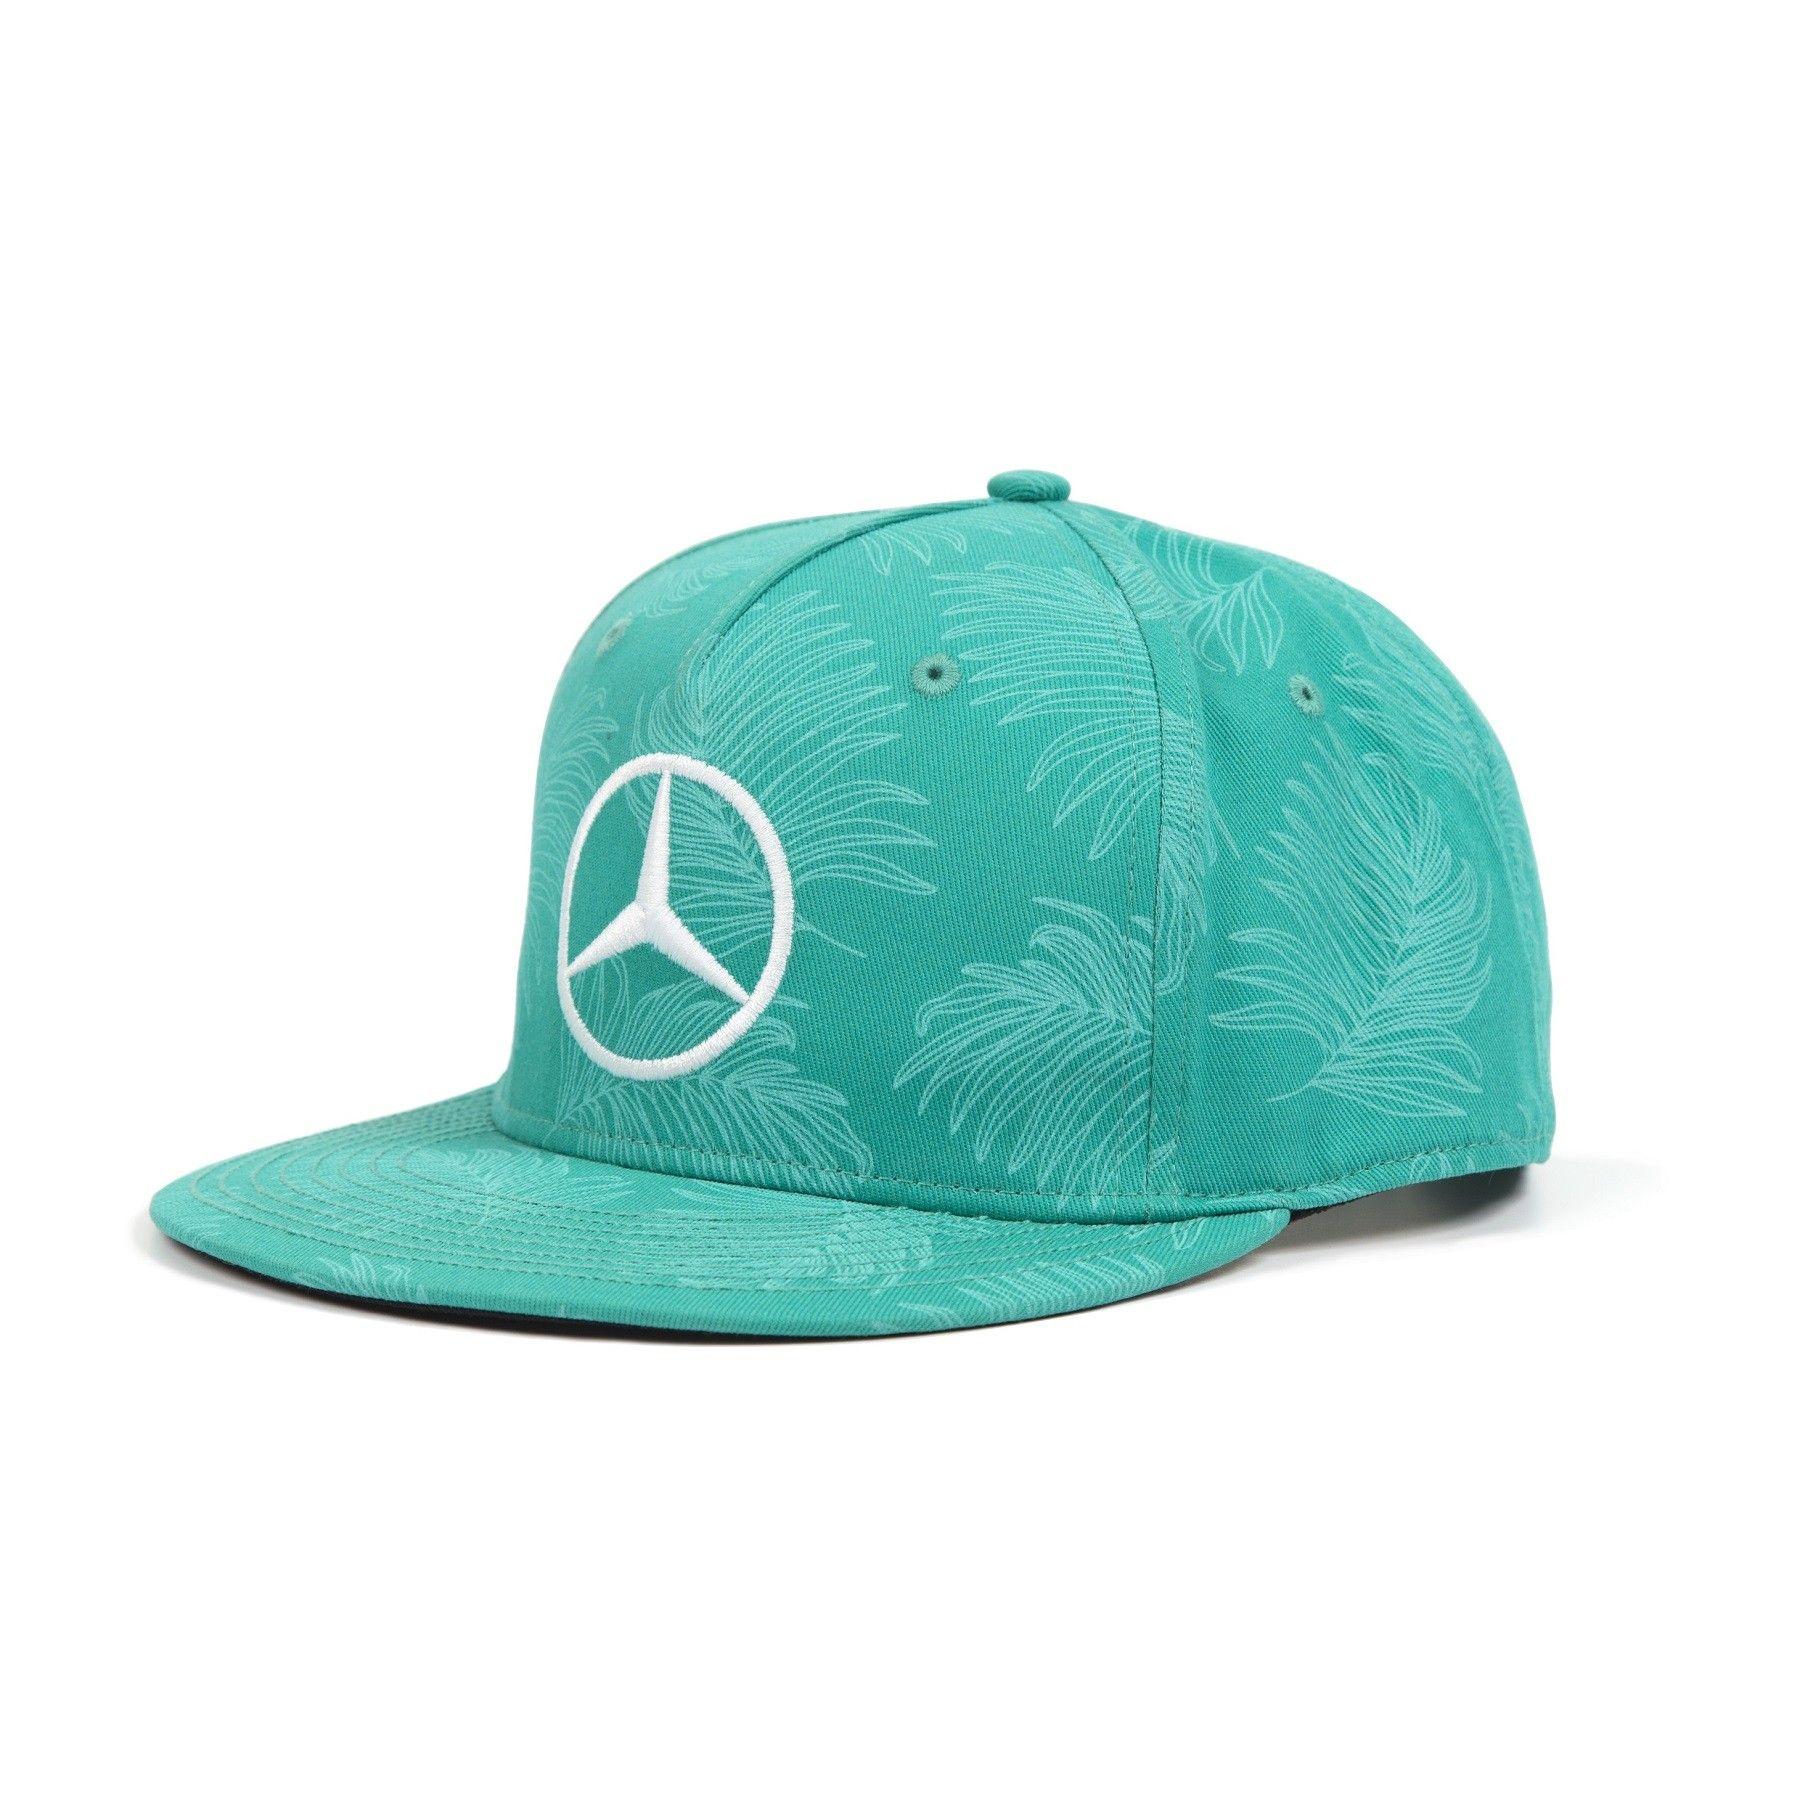 Lewis Hamilton 2017 Malaysia Grand Prix Cap ($47) | Lewis